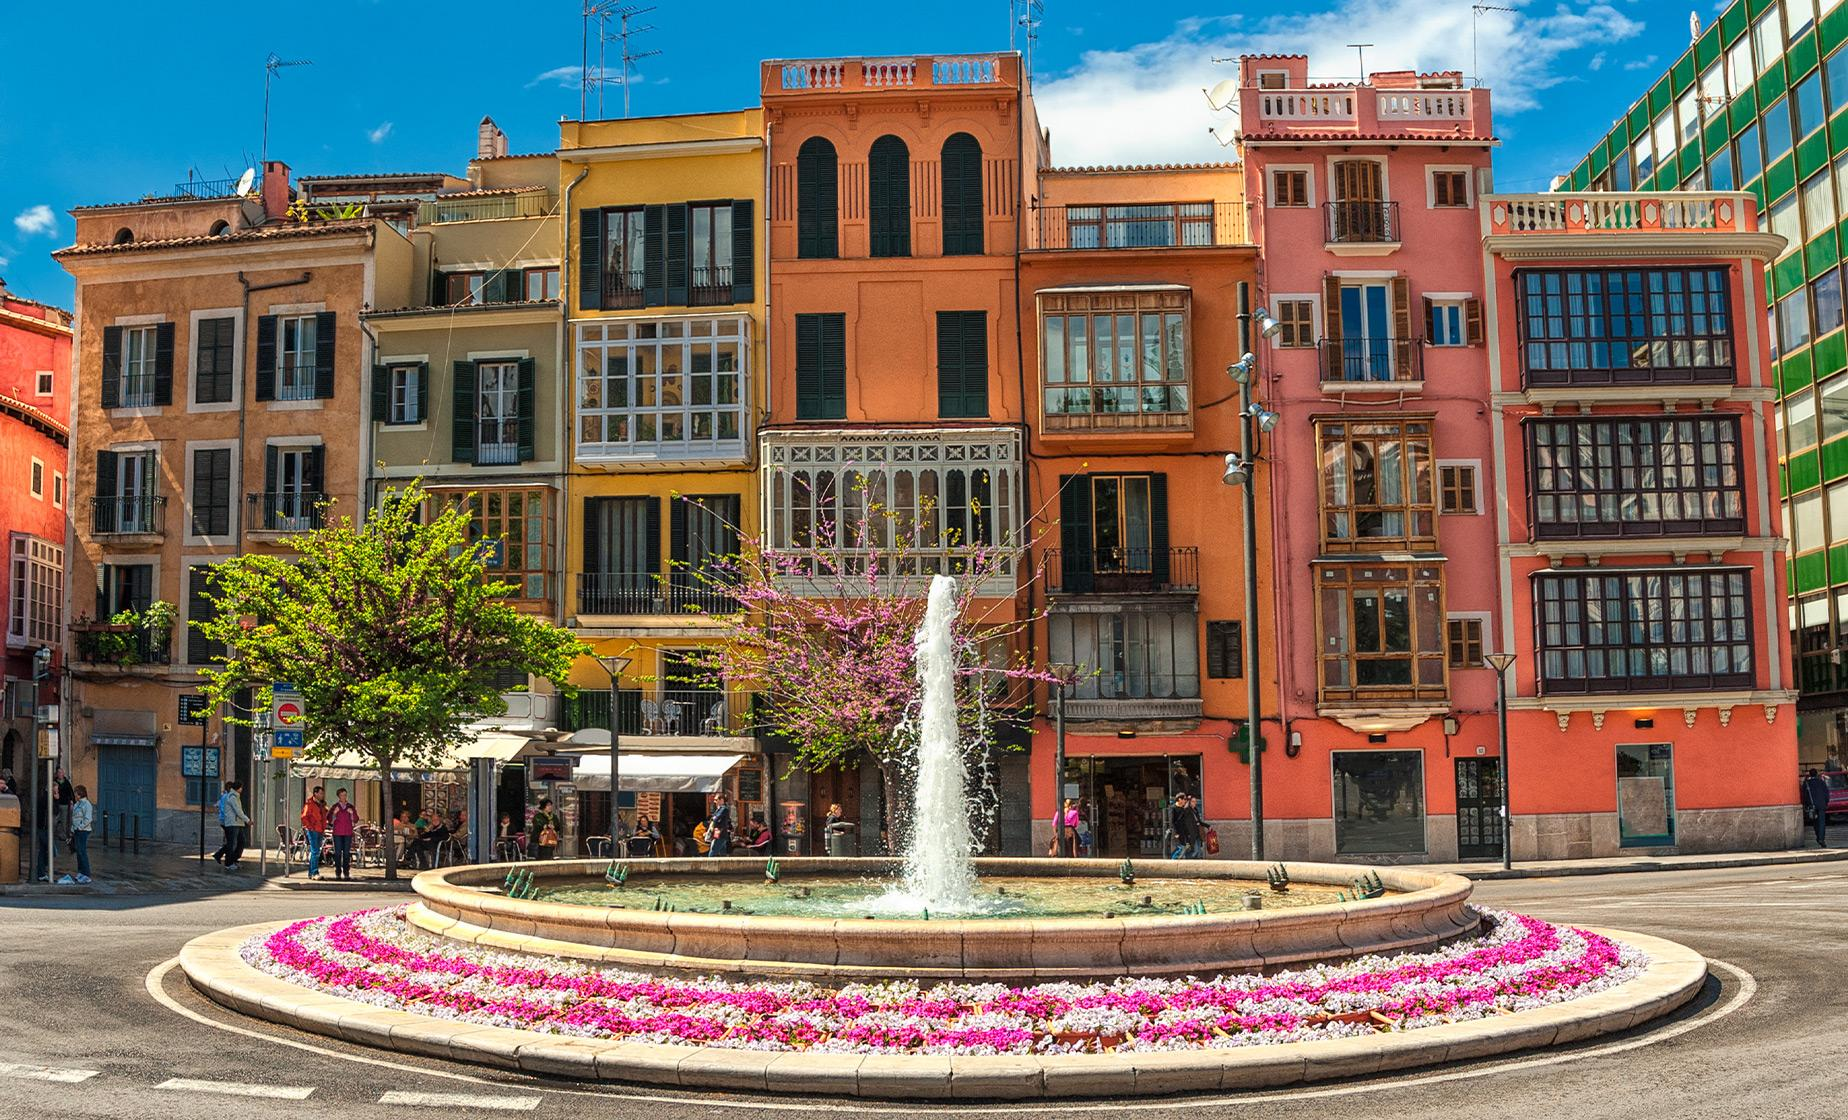 Private Palma de Mallorca Highlights - Full Day